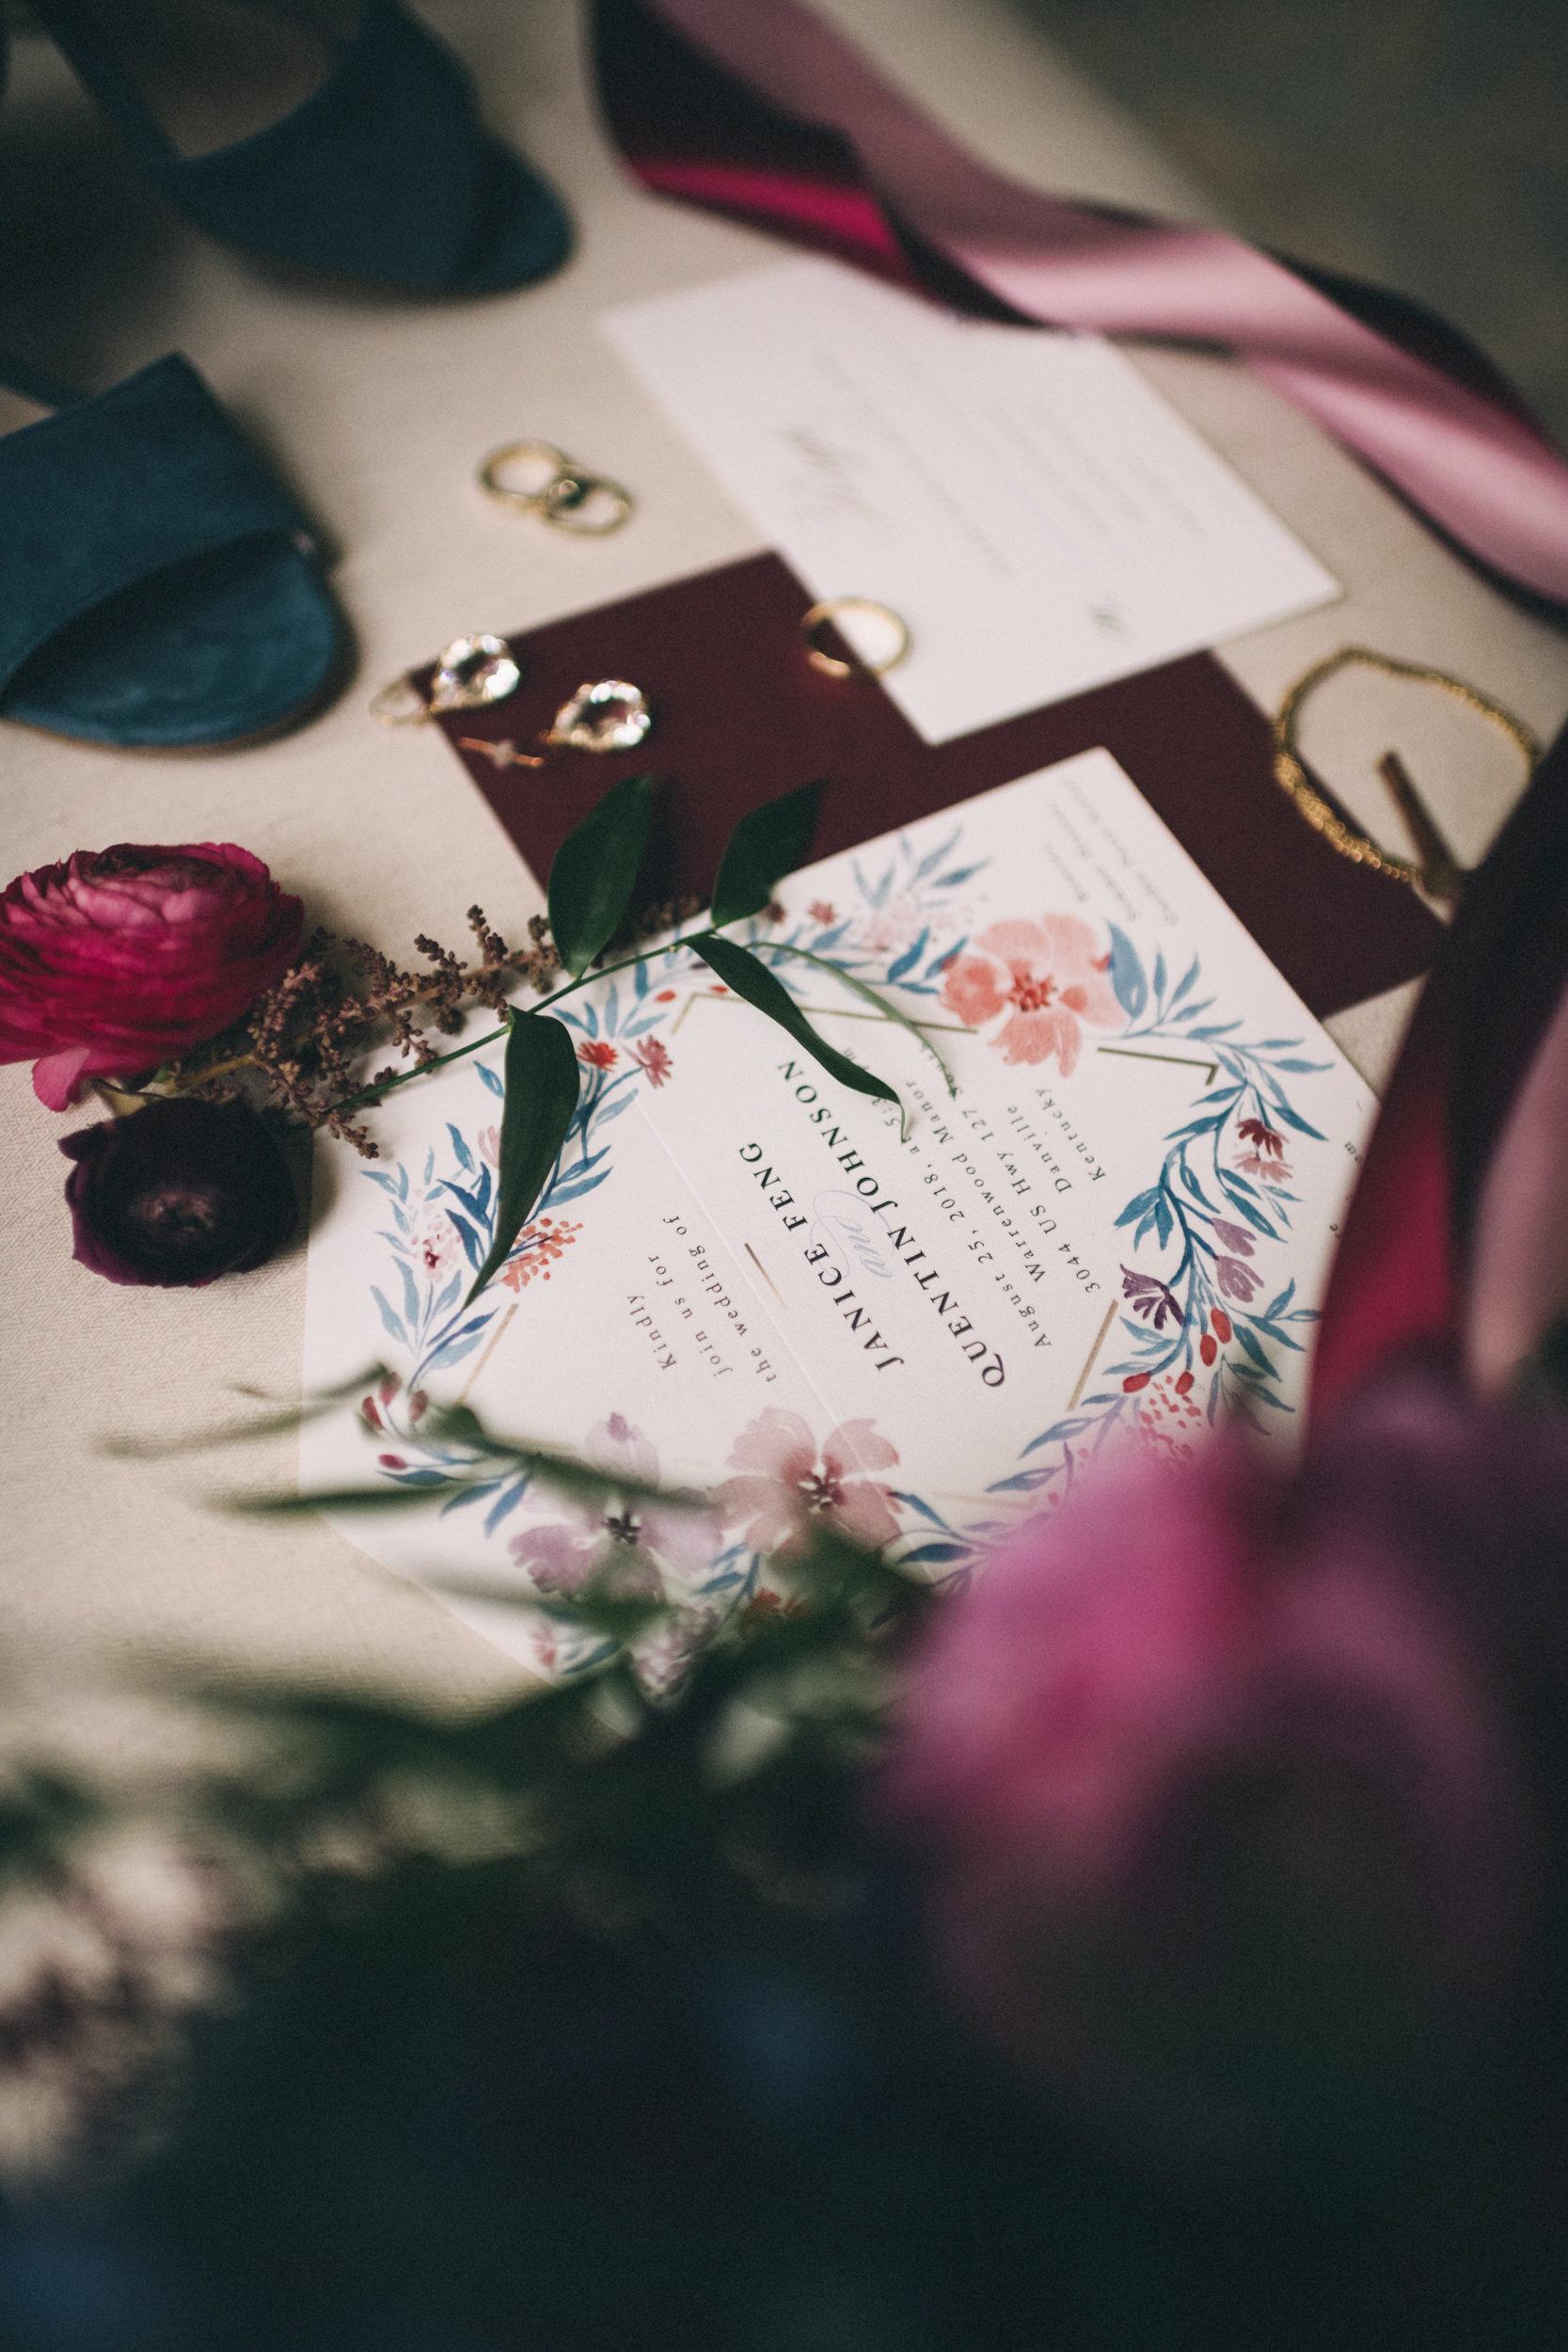 Louisville-Kentucky-Wedding-and-Elopement-Photographer-Sarah-Katherine-Davis-Photography-Summer-Jewel-Toned-Wedding-Chineese-Tea-Ceremony-Warrenwood-Manor-Danville-8.jpg